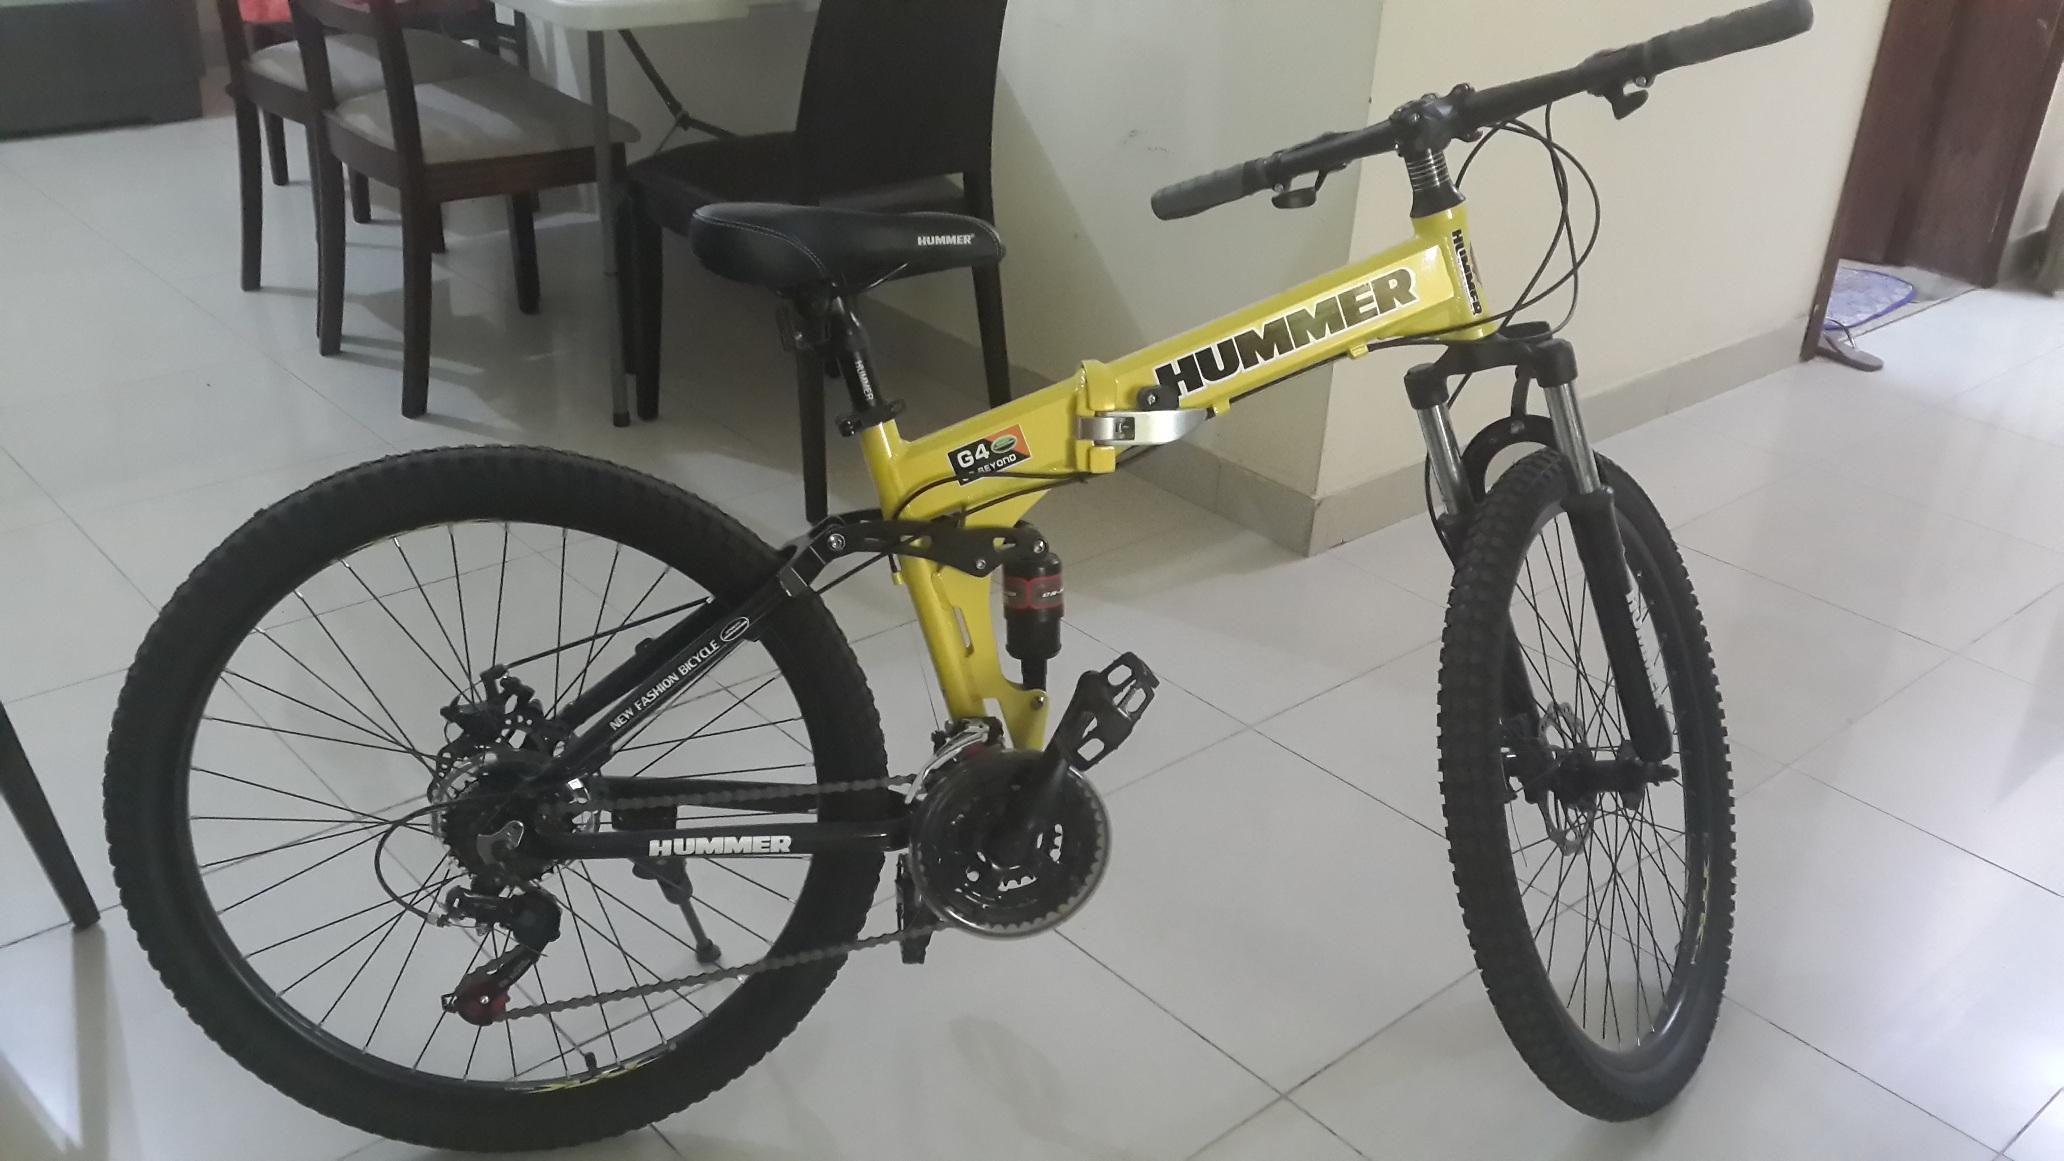 Hummer Bike Price In Qatar | Sport Cars Modifite | hummer bike sale